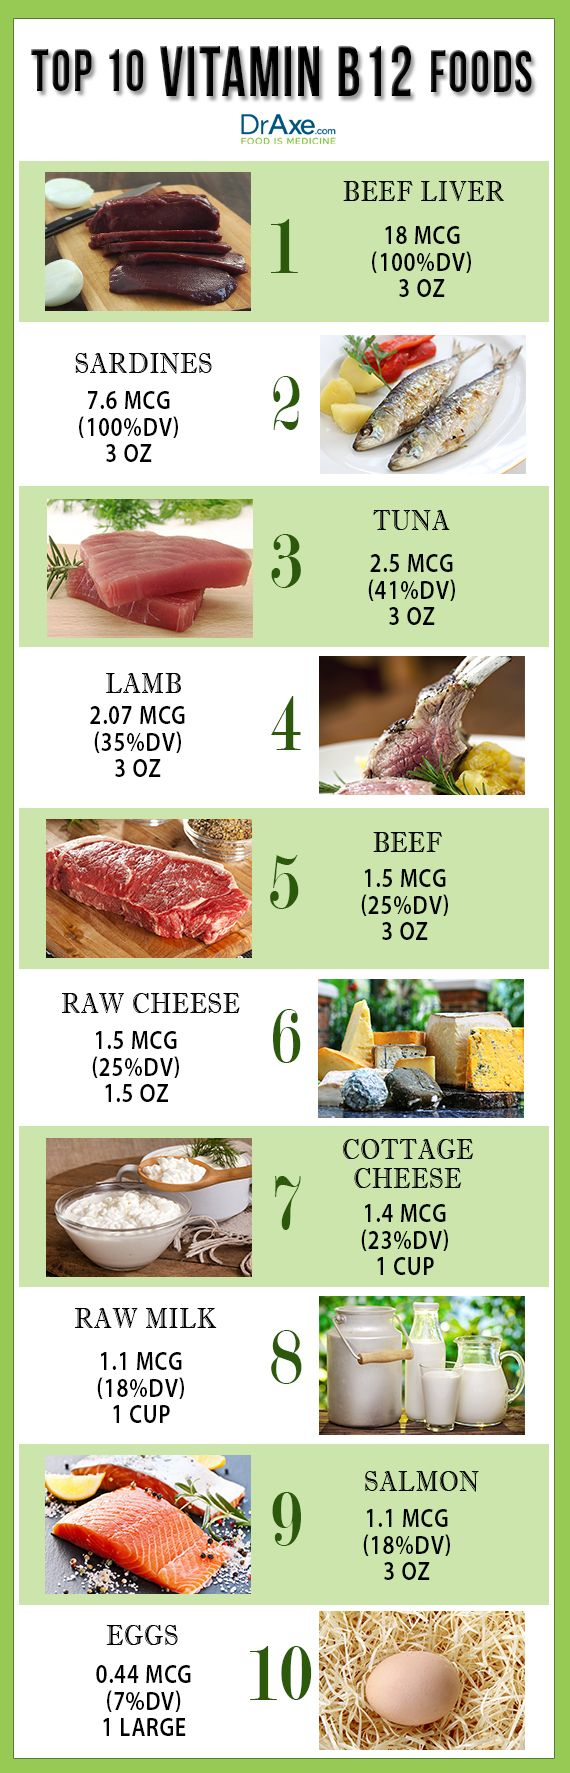 Top 10 Vitamin B12 Foods B12 foods, Vitamin a foods